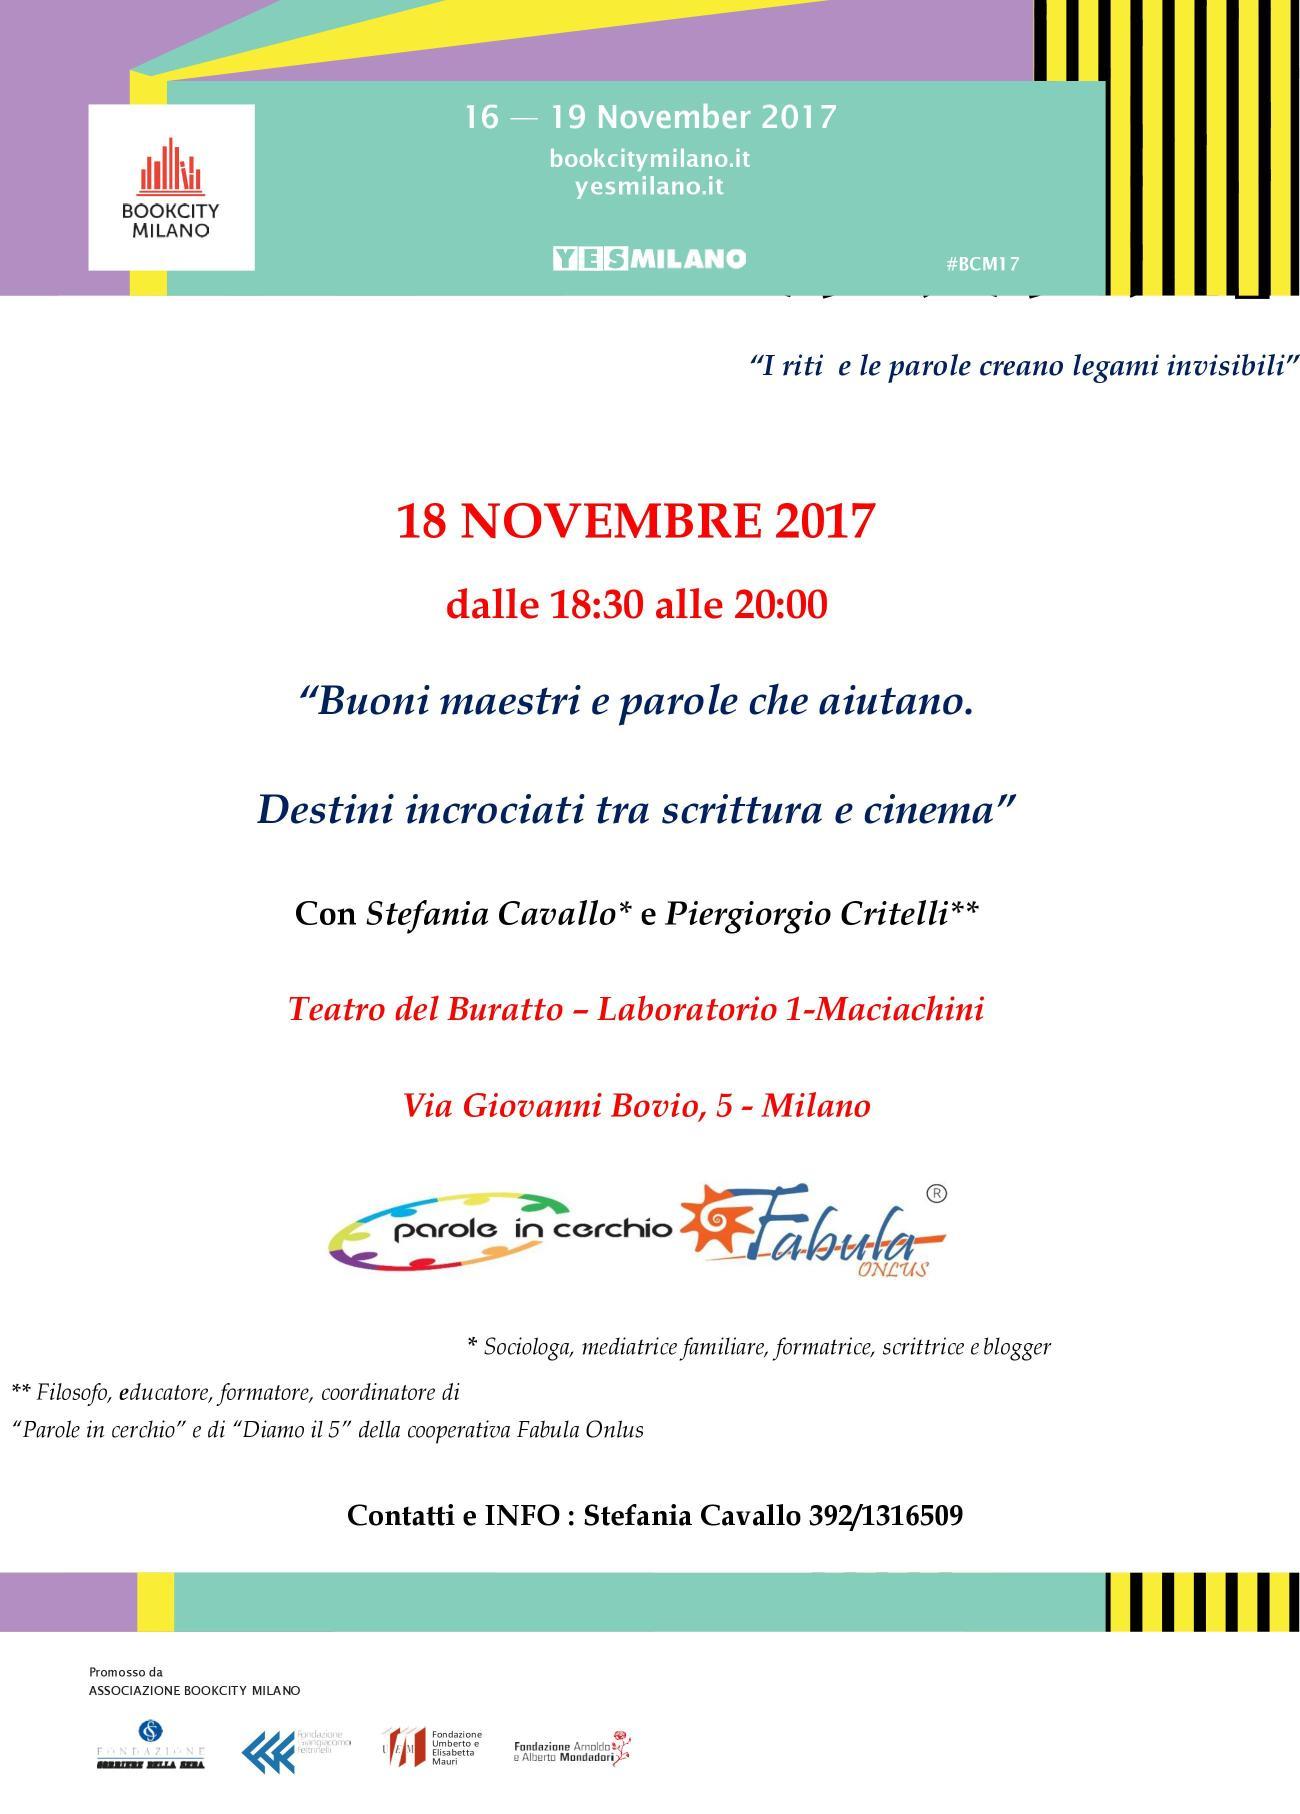 LOCANDINA BOOKCITY 2017 MILANO (1)